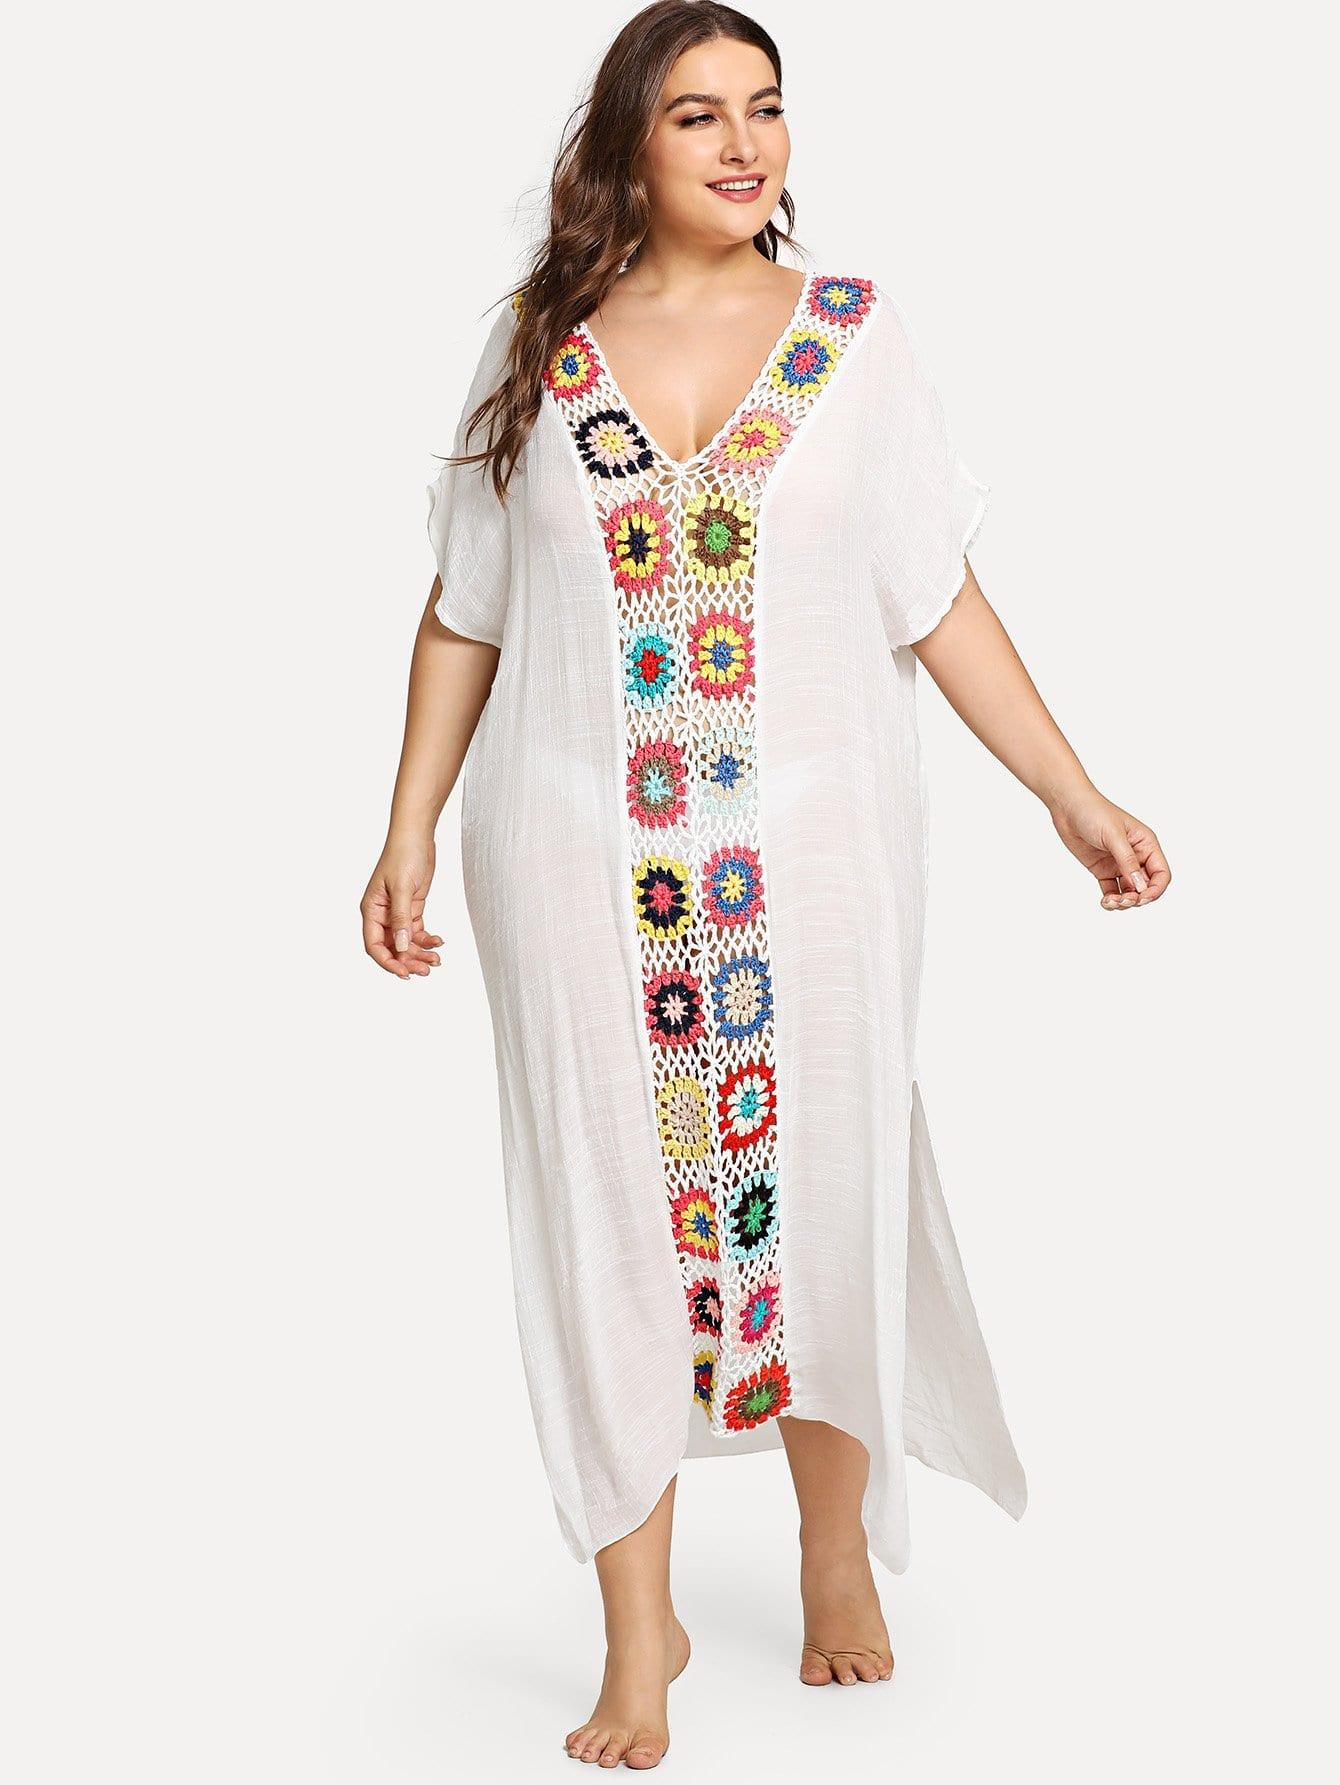 Plus Cut Out Crochet Dress mesh see through cut out crochet tights